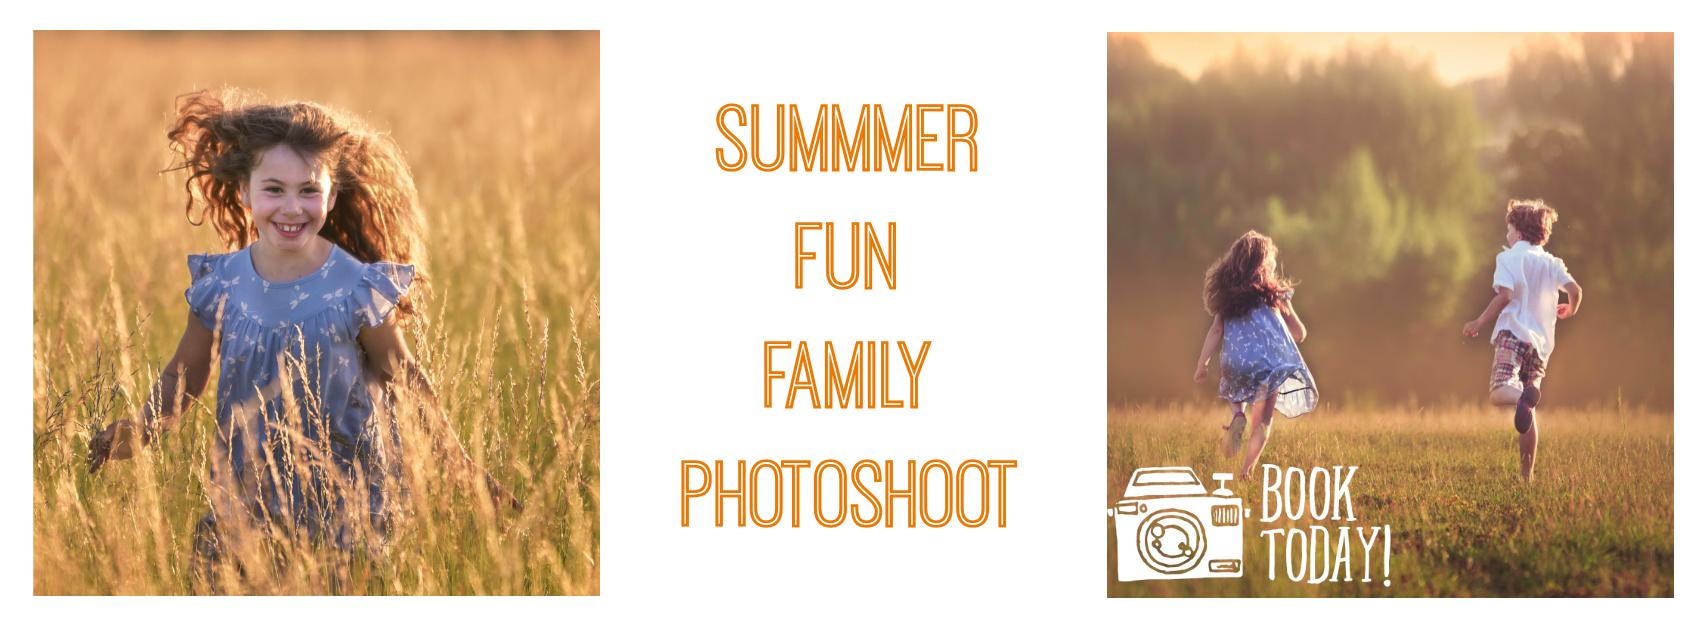 summer fun family .jpg